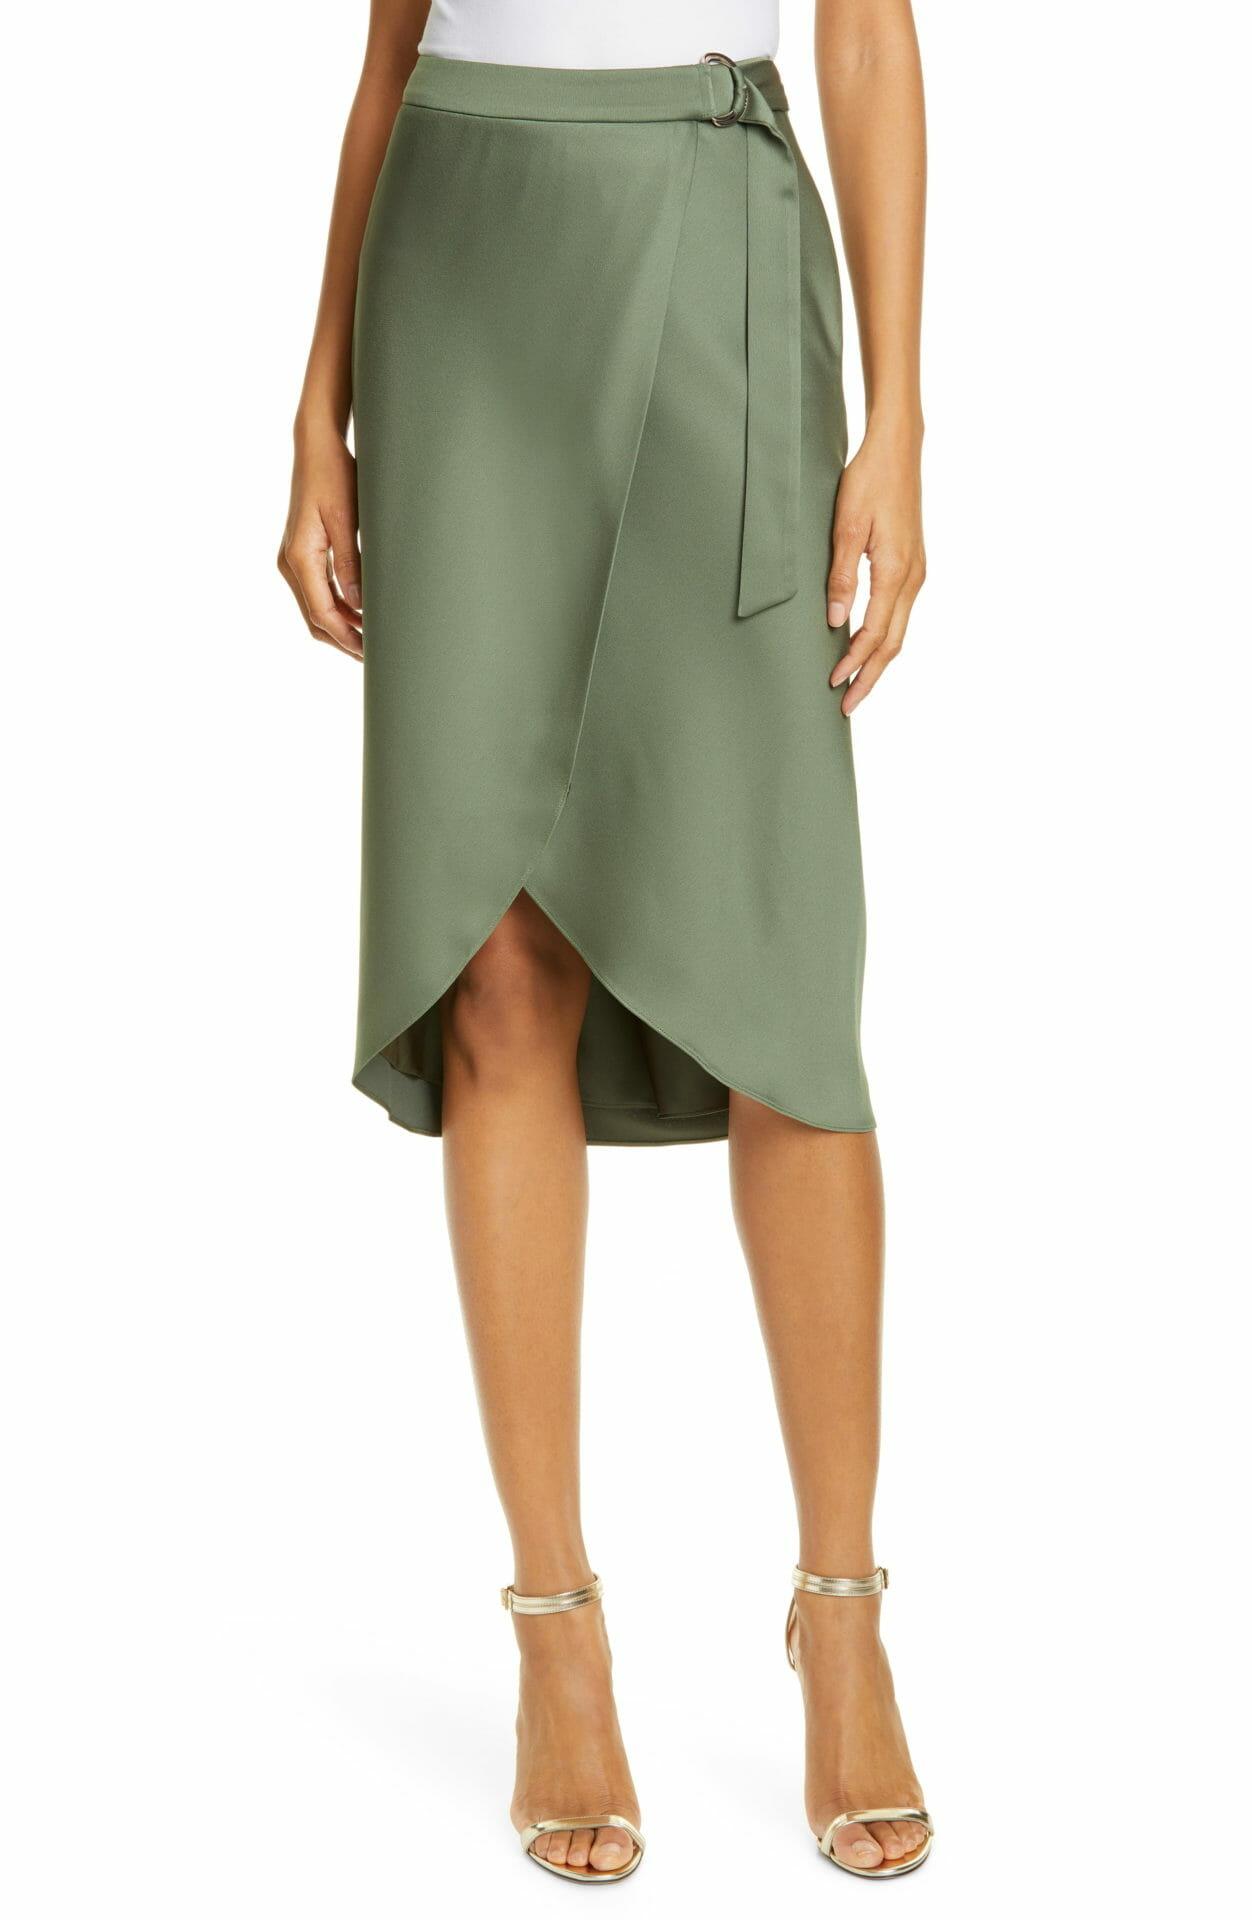 TED BAKER LONDON Aleyxa Belted Wrap Skirt, Main, color, KHAKI